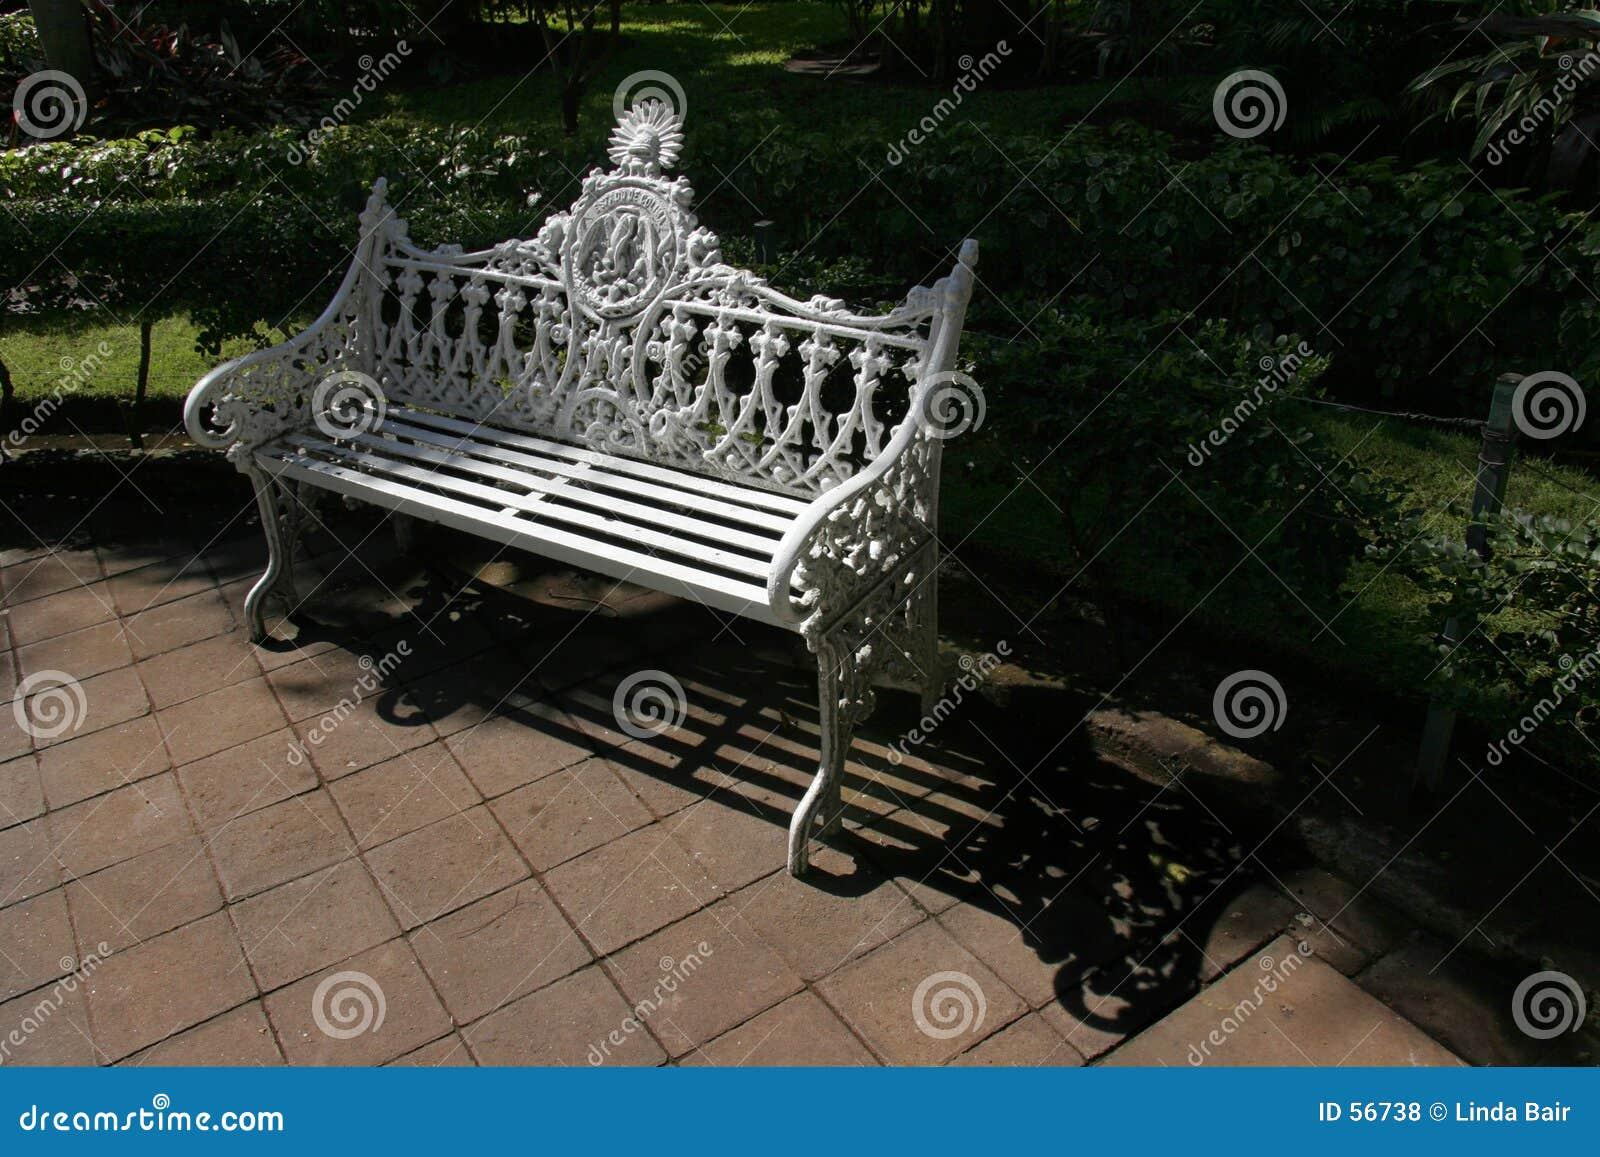 Ornate Park Bench Royalty Free Stock Photos Image 56738